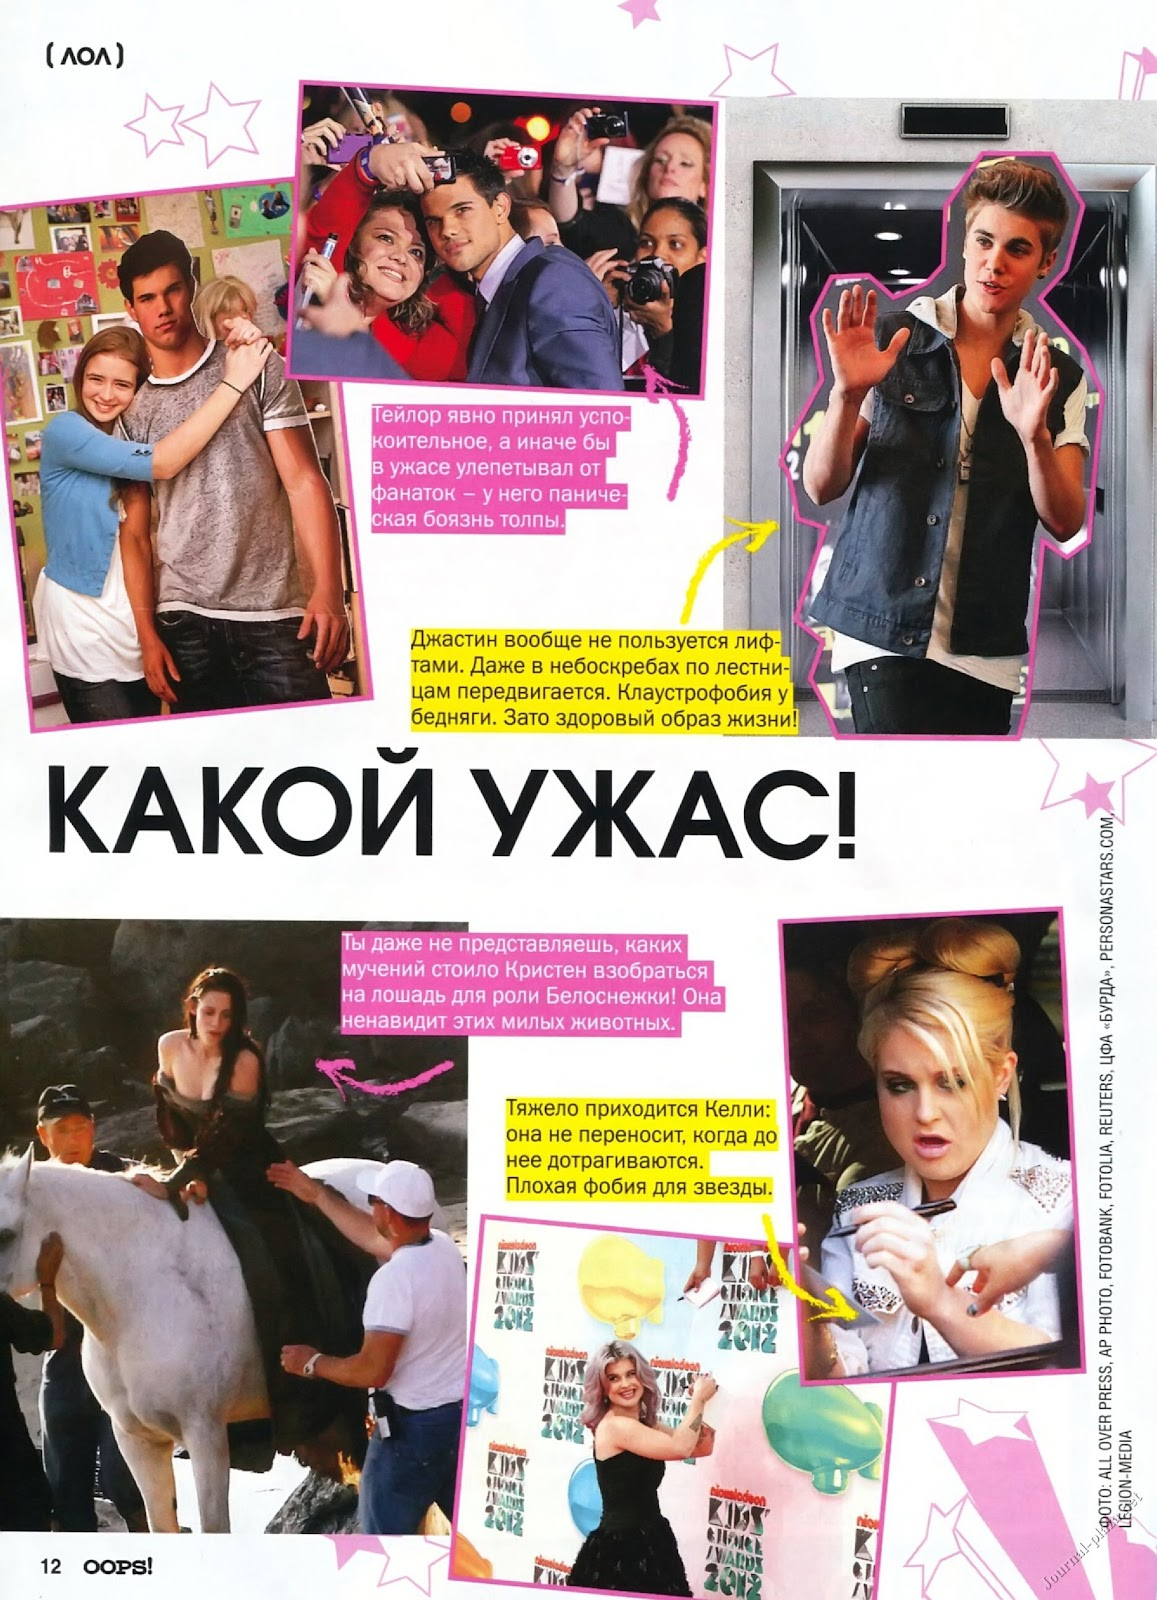 http://2.bp.blogspot.com/-i1C223u_t6k/UEKQaBjedeI/AAAAAAAAFs8/DfDWZRegcbo/s1600/Oops912_Jurnalik.Ru_page_11.jpg